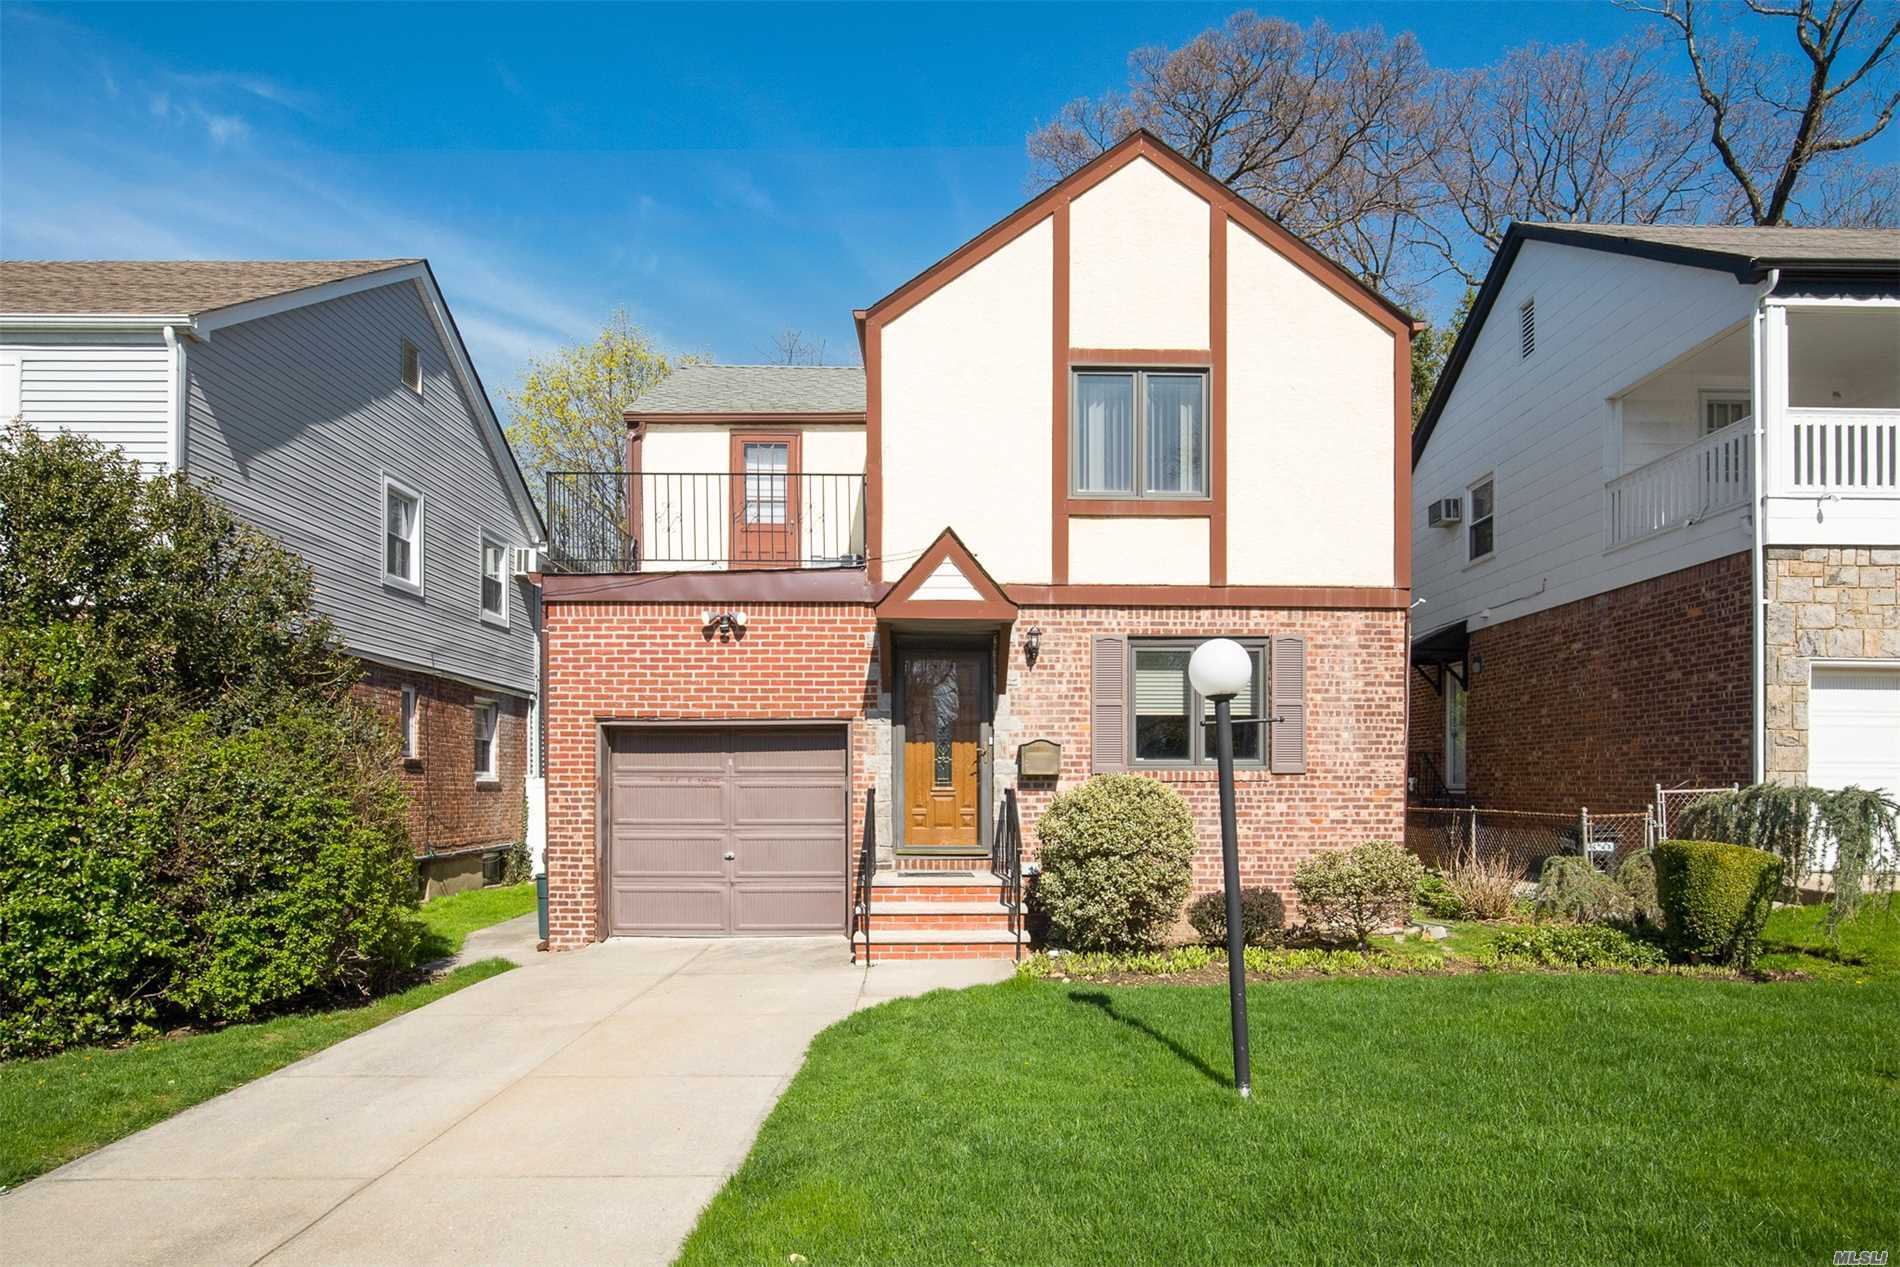 80-45 214 St Hollis Hills, NY 11427